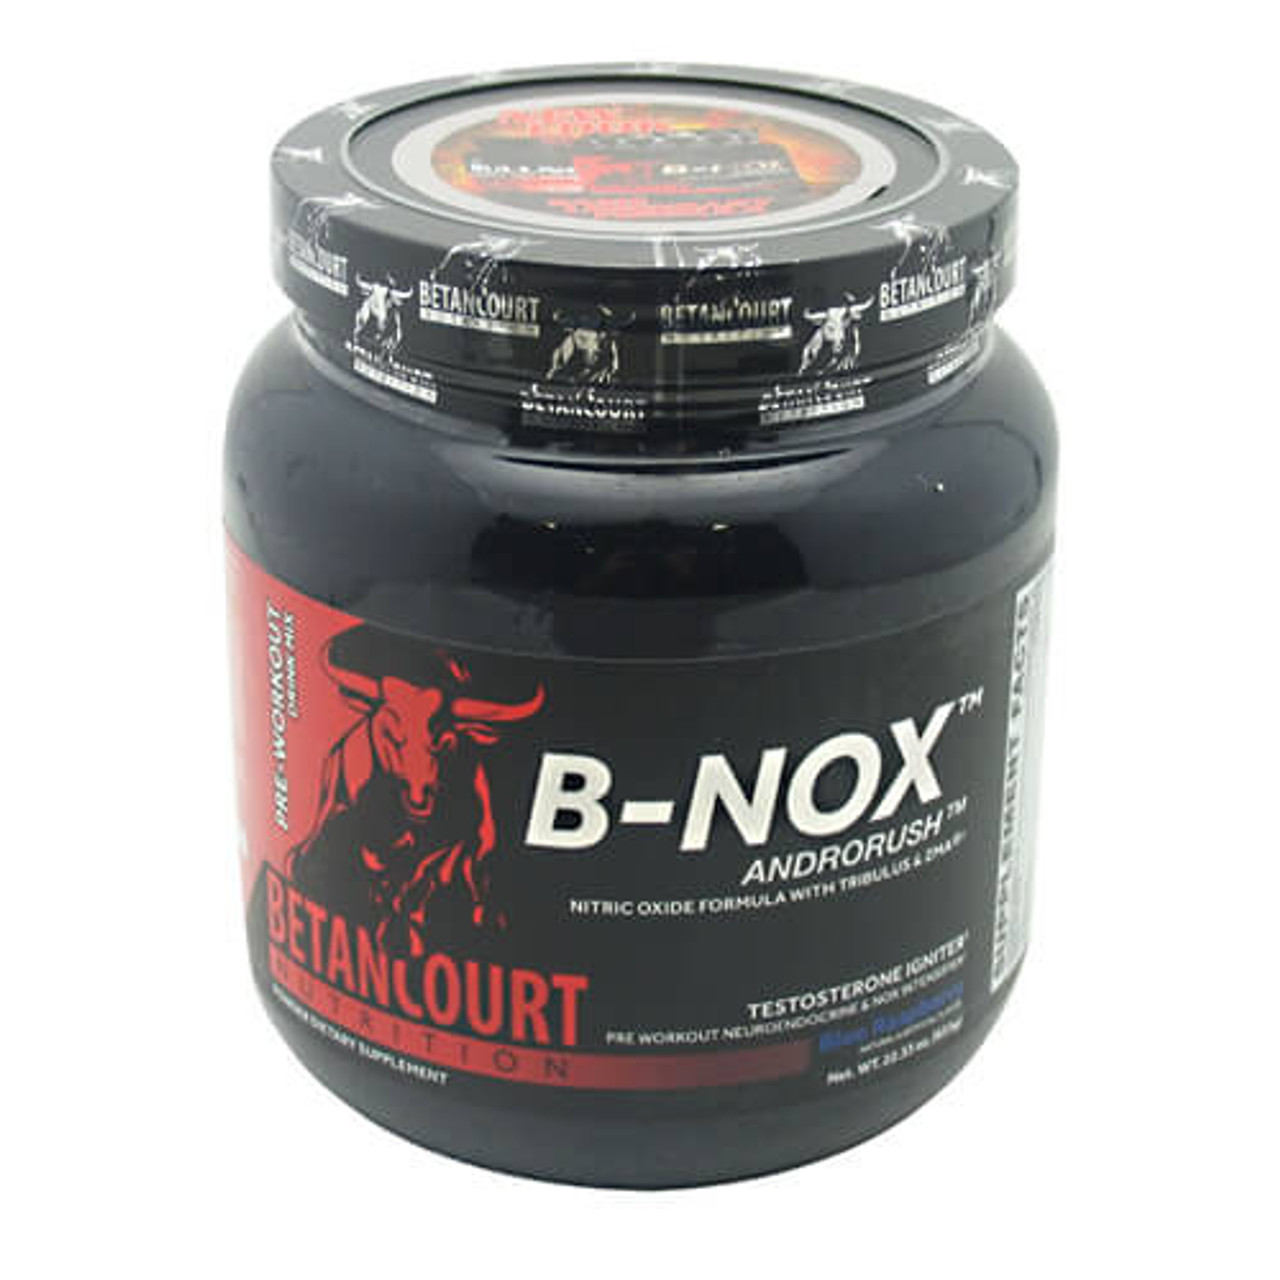 B-Nox 35sv Betancourt Nutrition